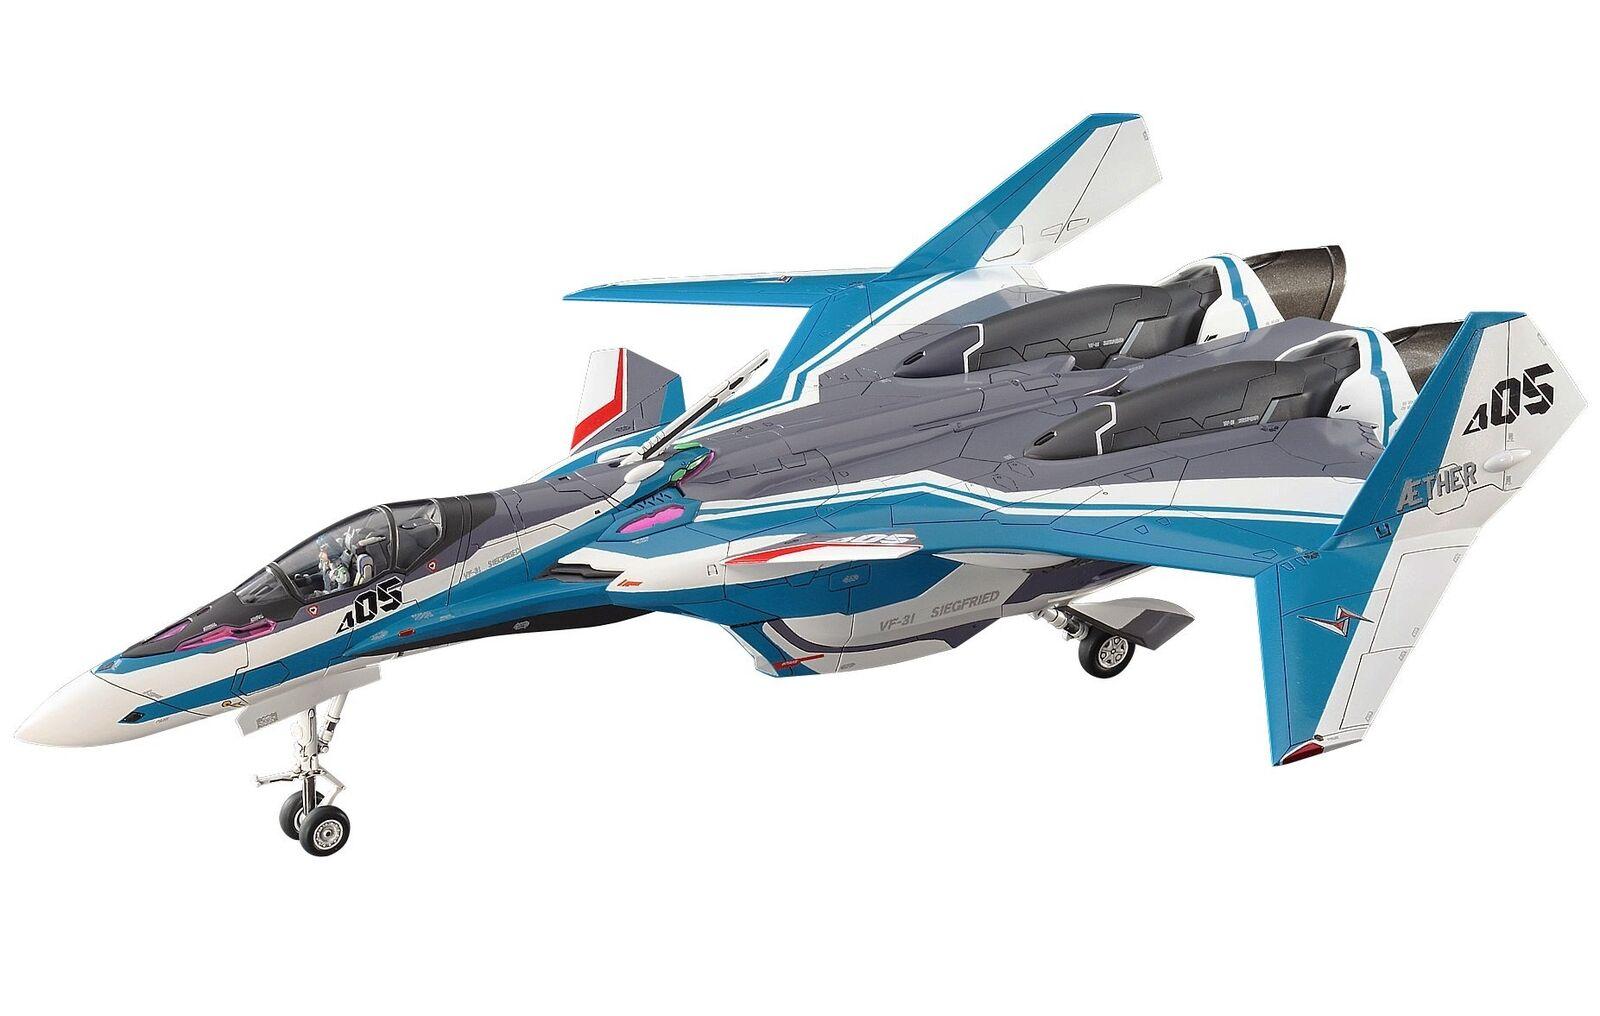 Hasegawa Macross Series  Macross Delta  VF-31J Siegfried Hayate 1 72